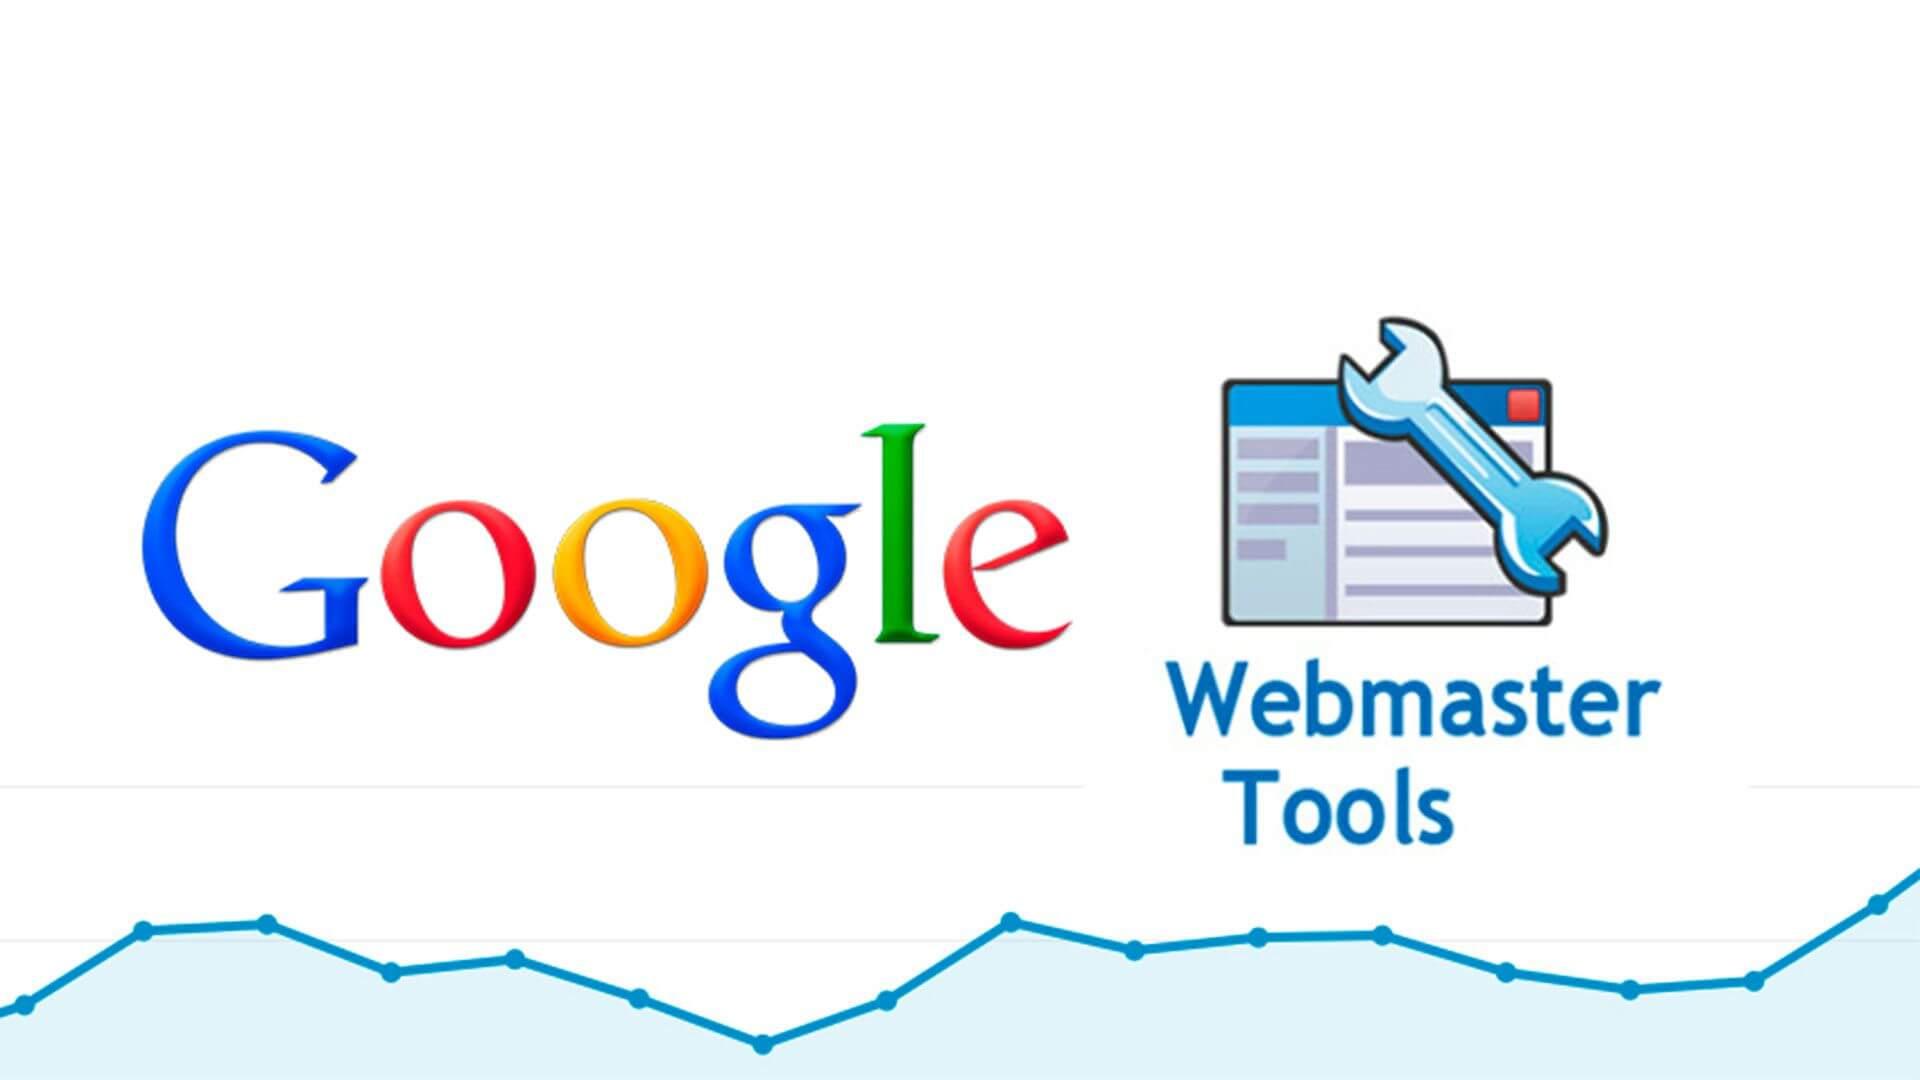 Agencia Sidecar google-webmaster-tools-agencia-sidecar-logo Introducción a Google Webmaster Tools